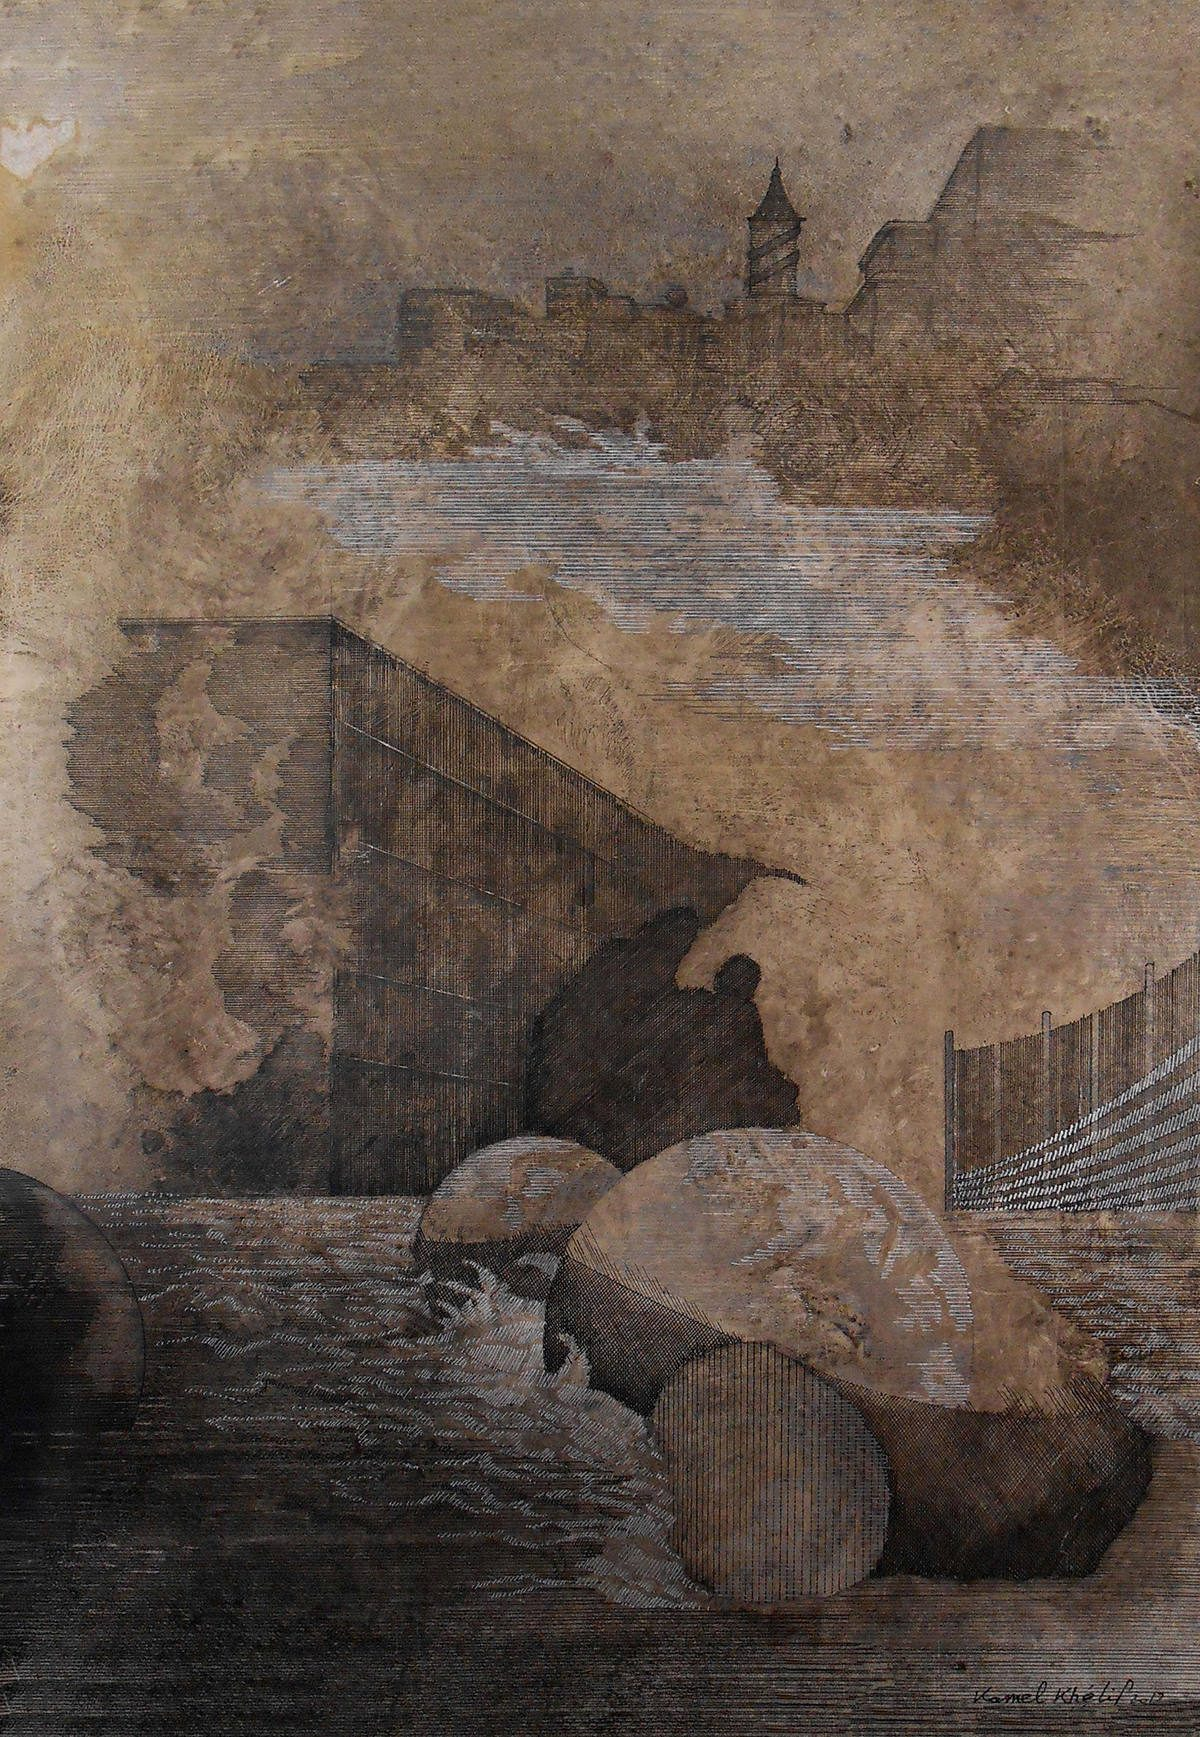 Kamel Khélif, courtesy galerie Béatrice Soulié